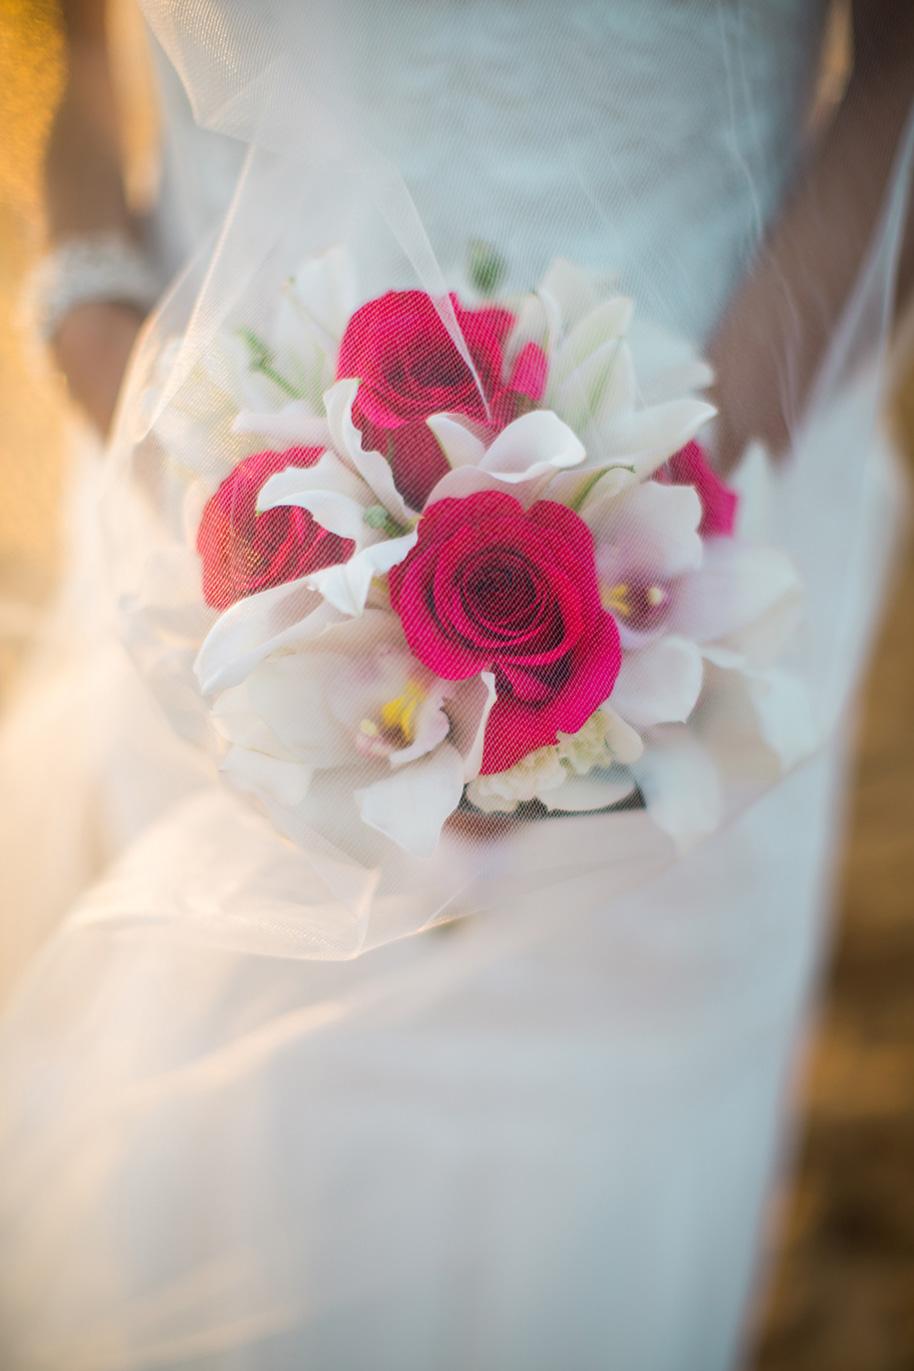 Maui-Beach-Wedding-041216-22